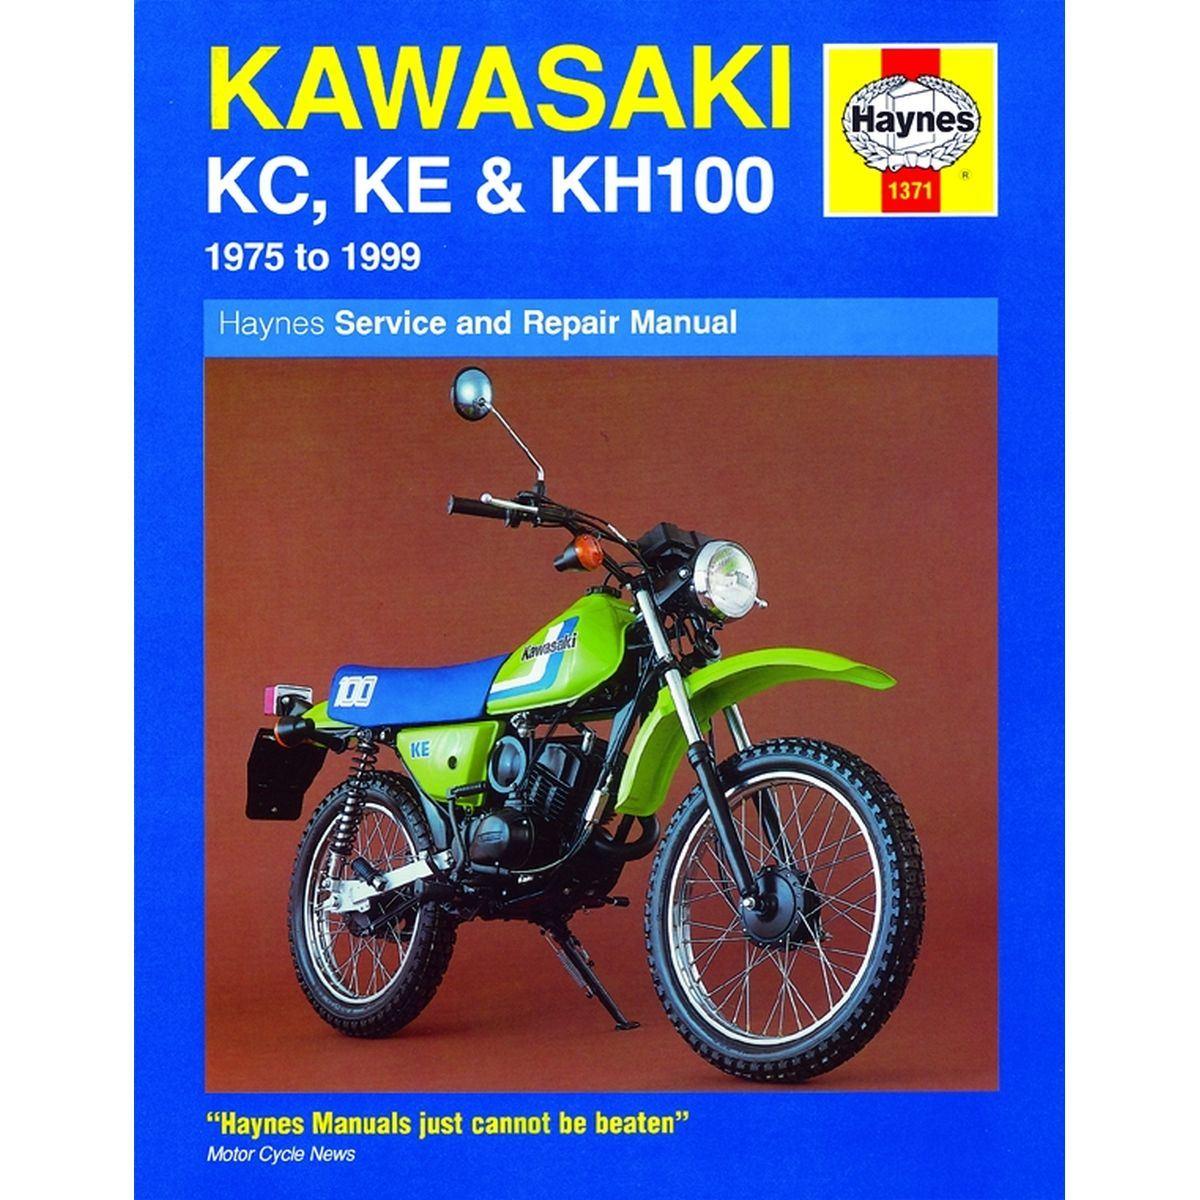 Kawasaki Hdx 100 Manual 1975 Wiring Diagram I Need For Motorcycles Question Werkstatthandbuch Zzr 600 Deutsch